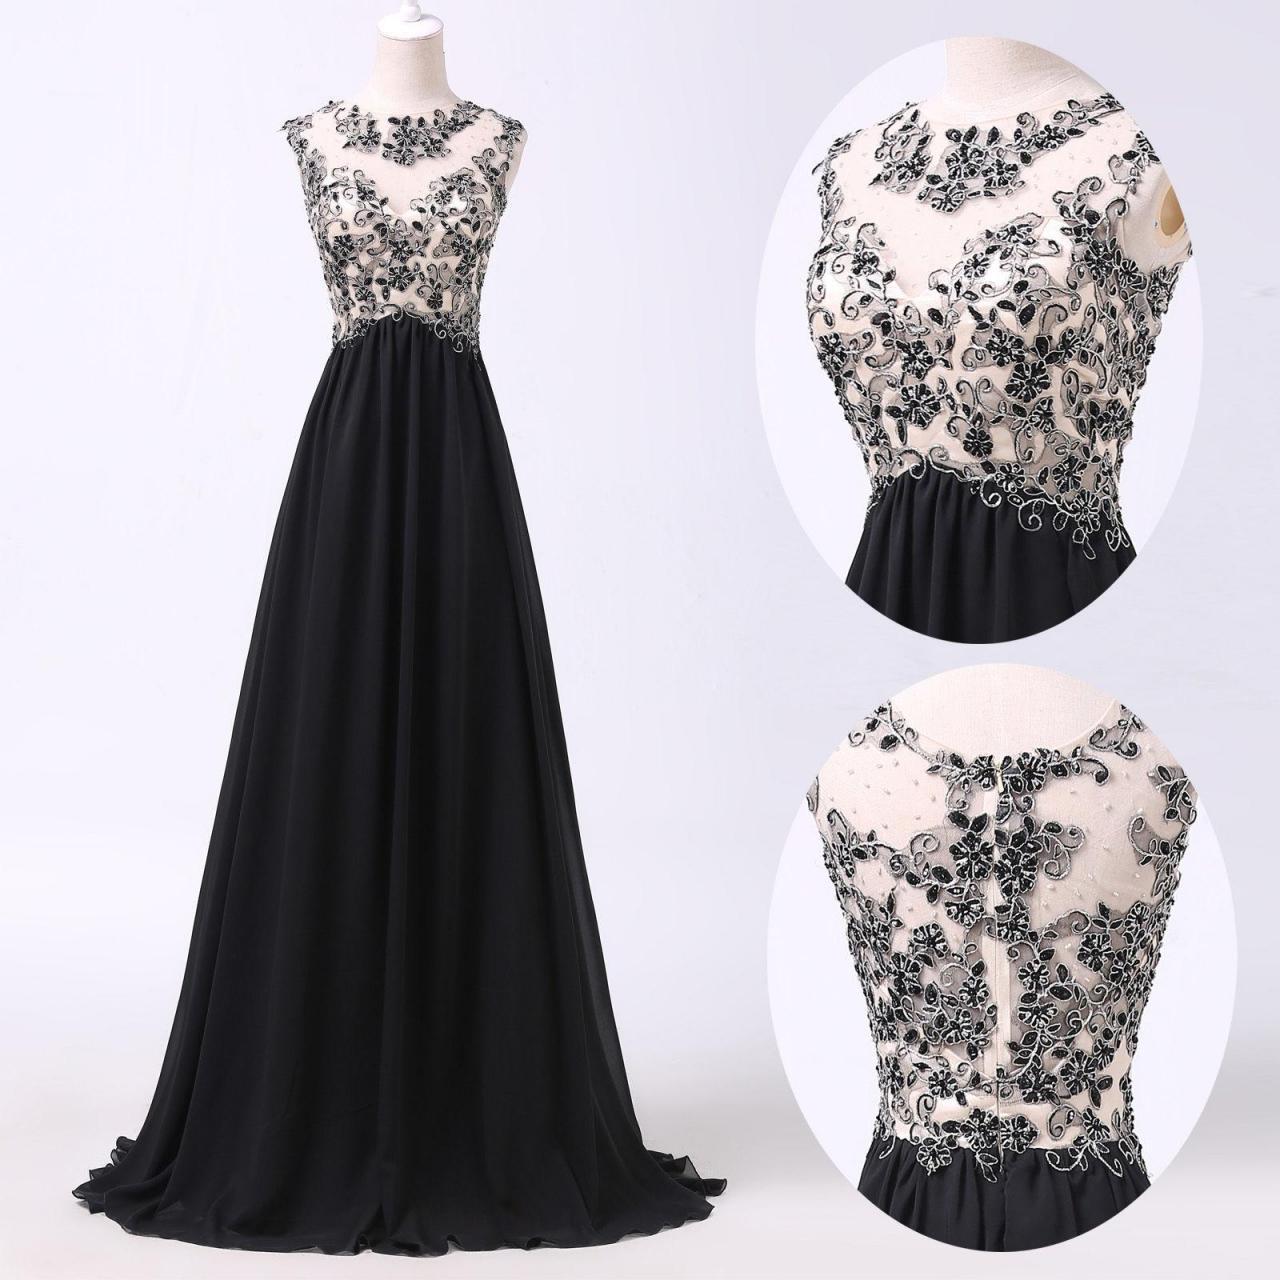 A Line Prom Dresses,Black Lace Prom Dress,Simple Prom Dress,Modest ...